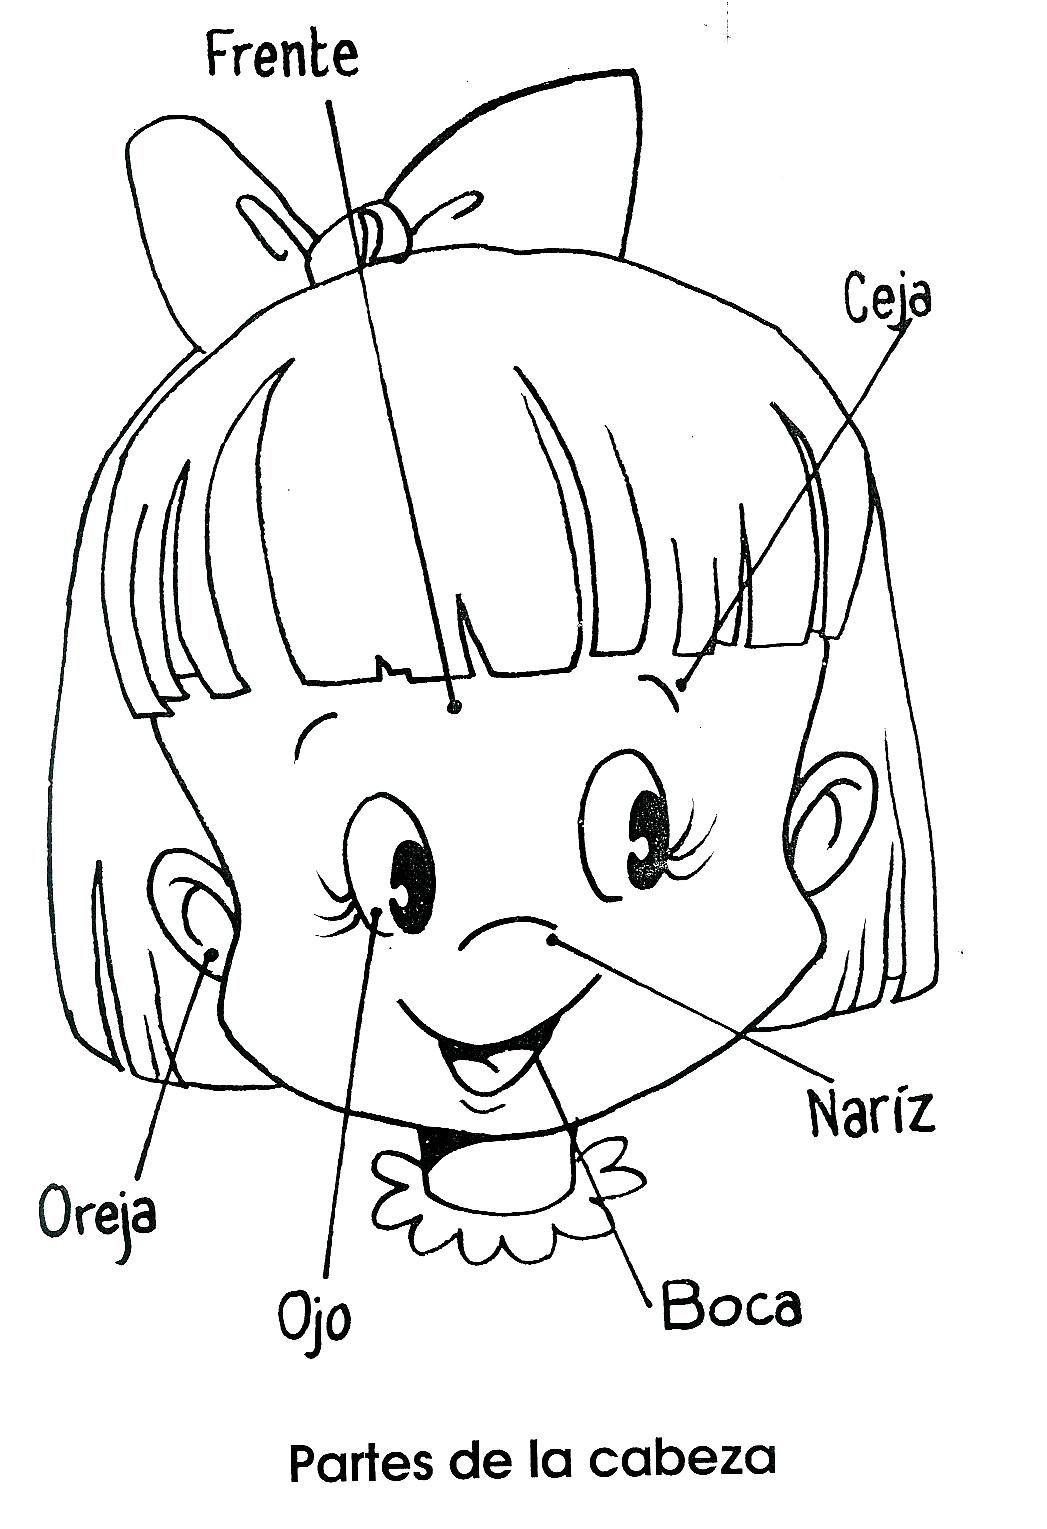 Aprender a dibujar y pintar - Dibujos para colorear -   Com dibuixar ...